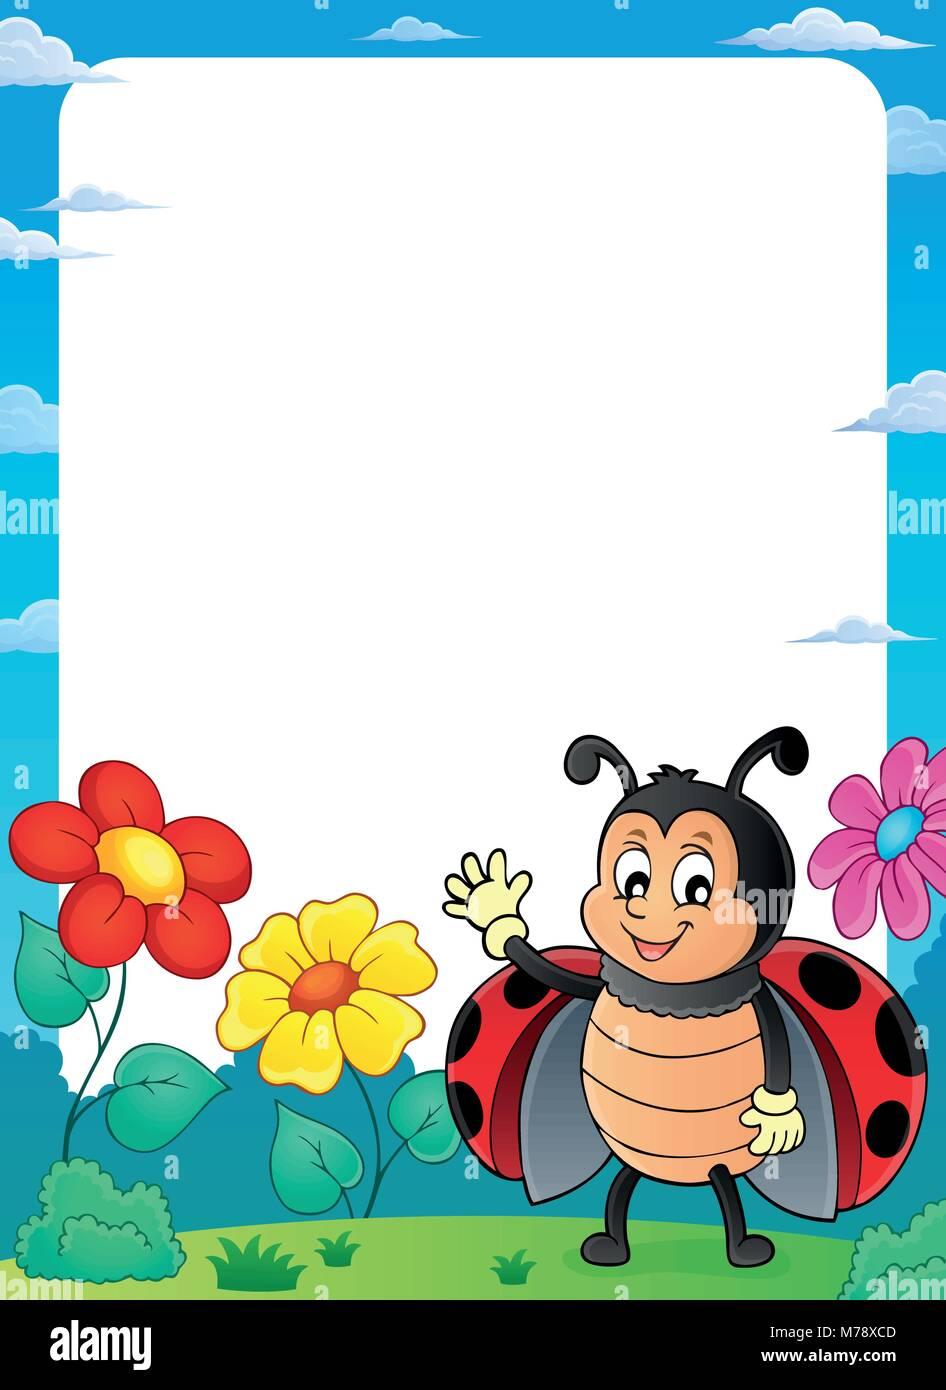 Ladybug theme frame 2 - eps10 vector illustration Stock Vector Art ...